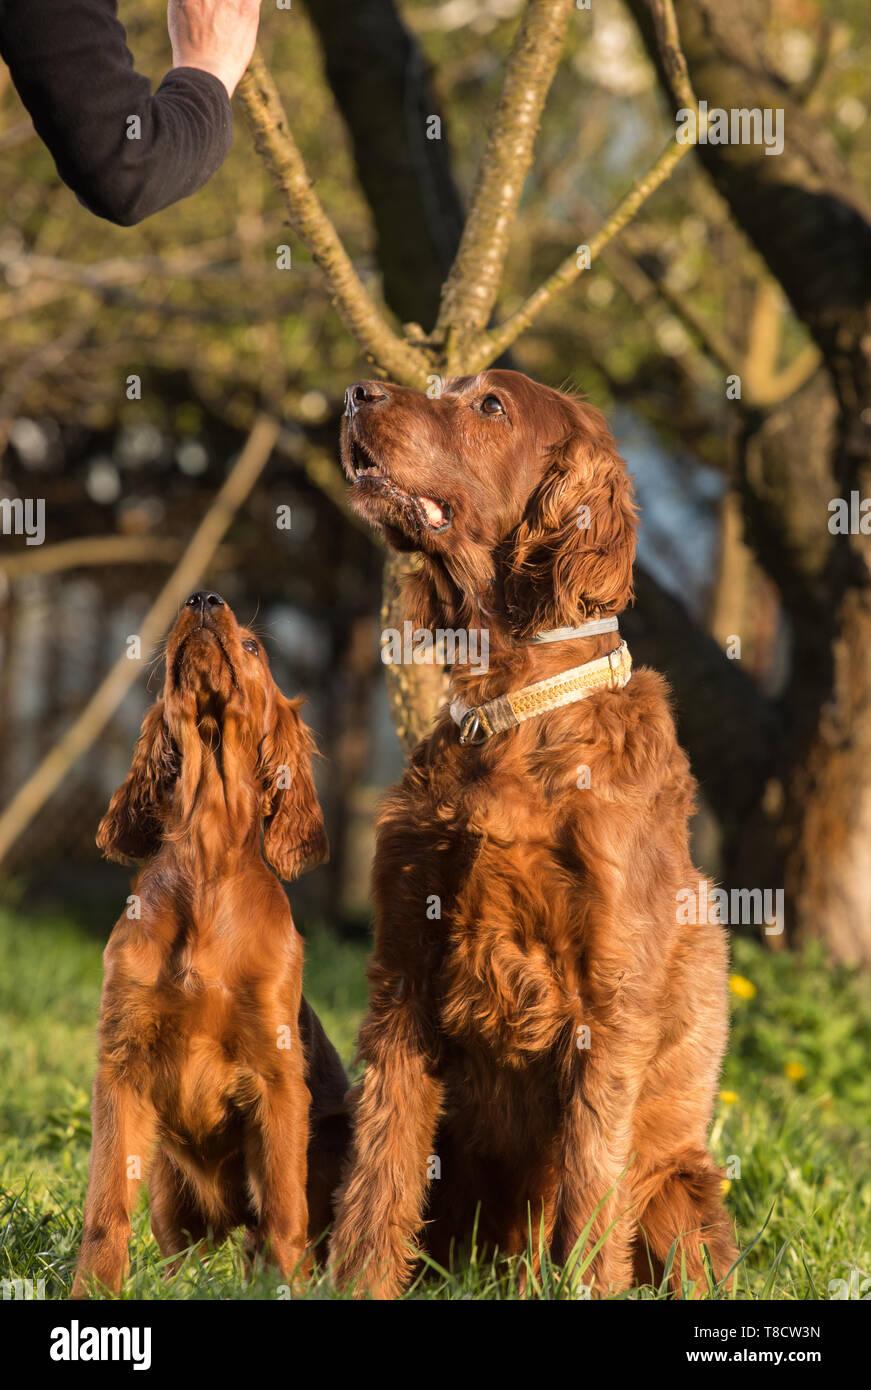 4dcead7c881 Irish Setter Dog Hunting Stock Photos & Irish Setter Dog Hunting ...